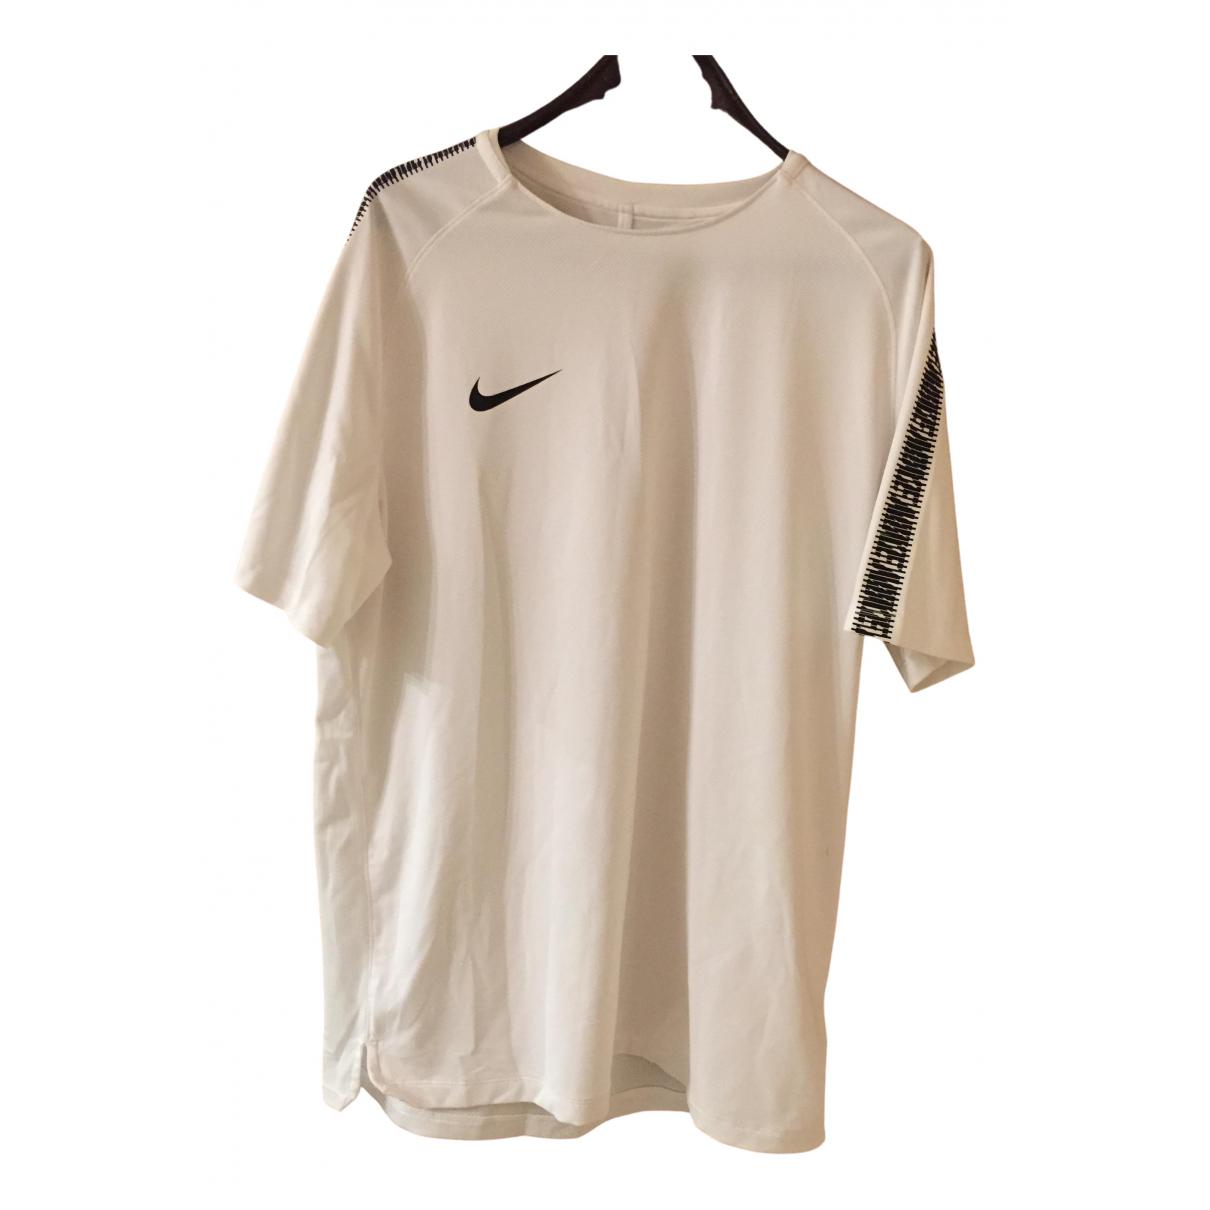 Nike - Tee shirts   pour homme - blanc